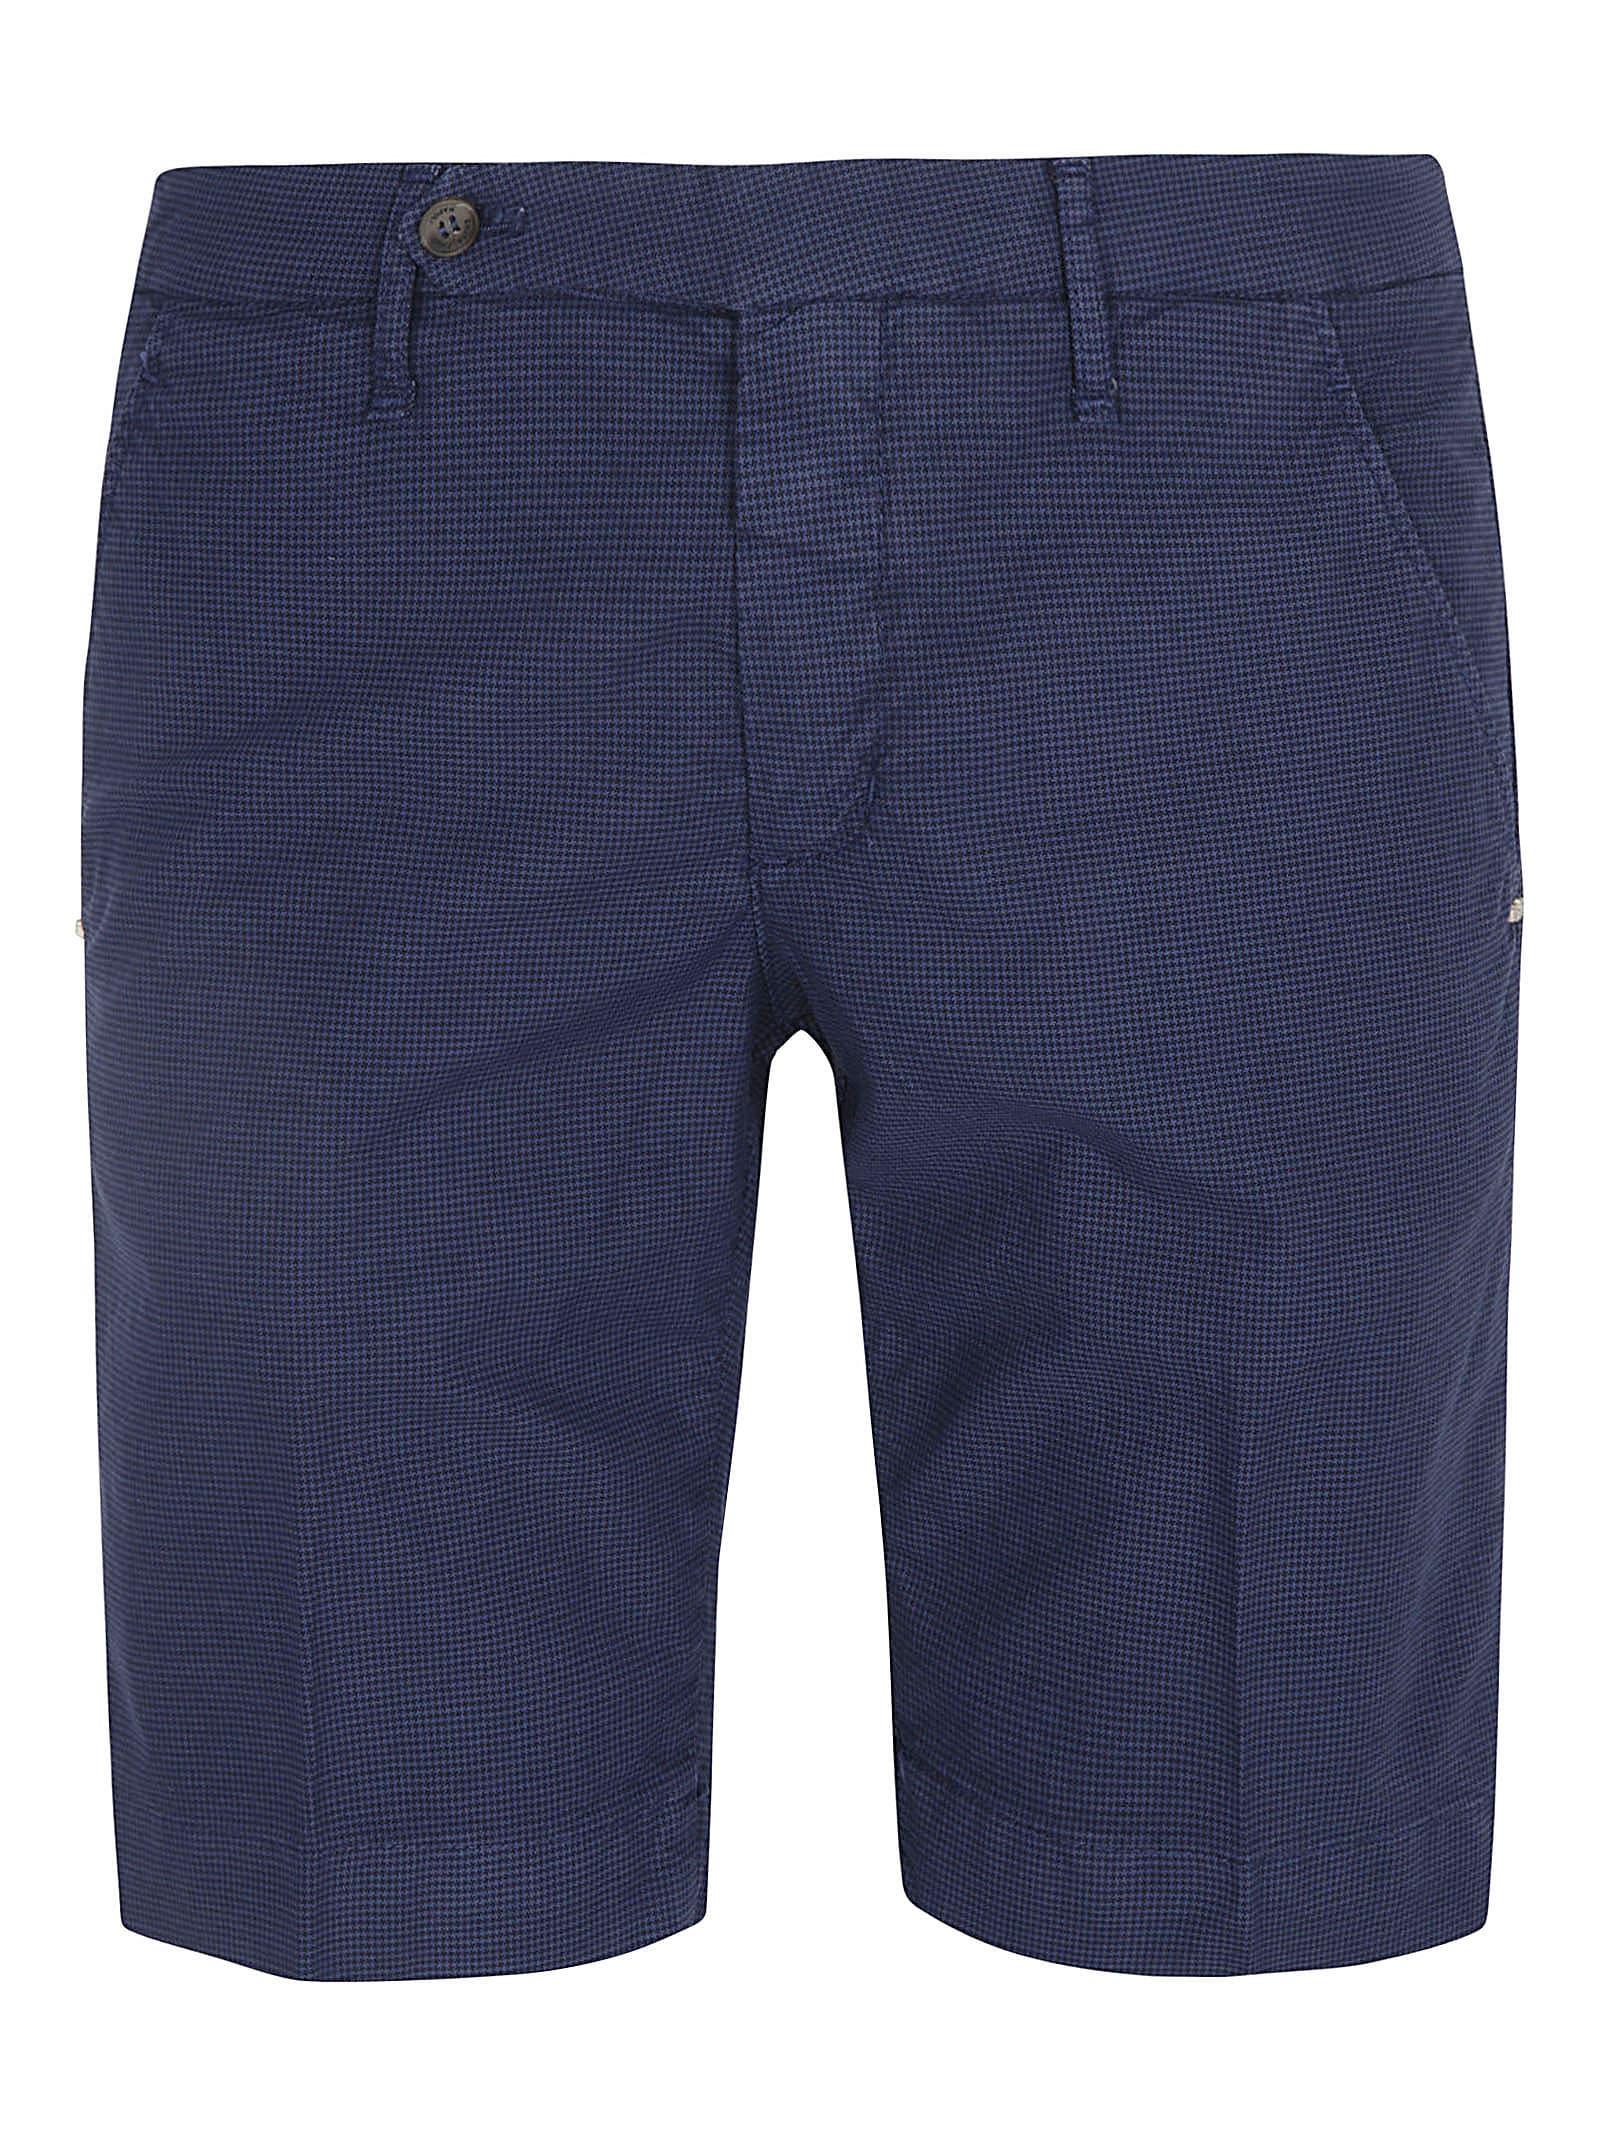 Classic Slim Fit Shorts